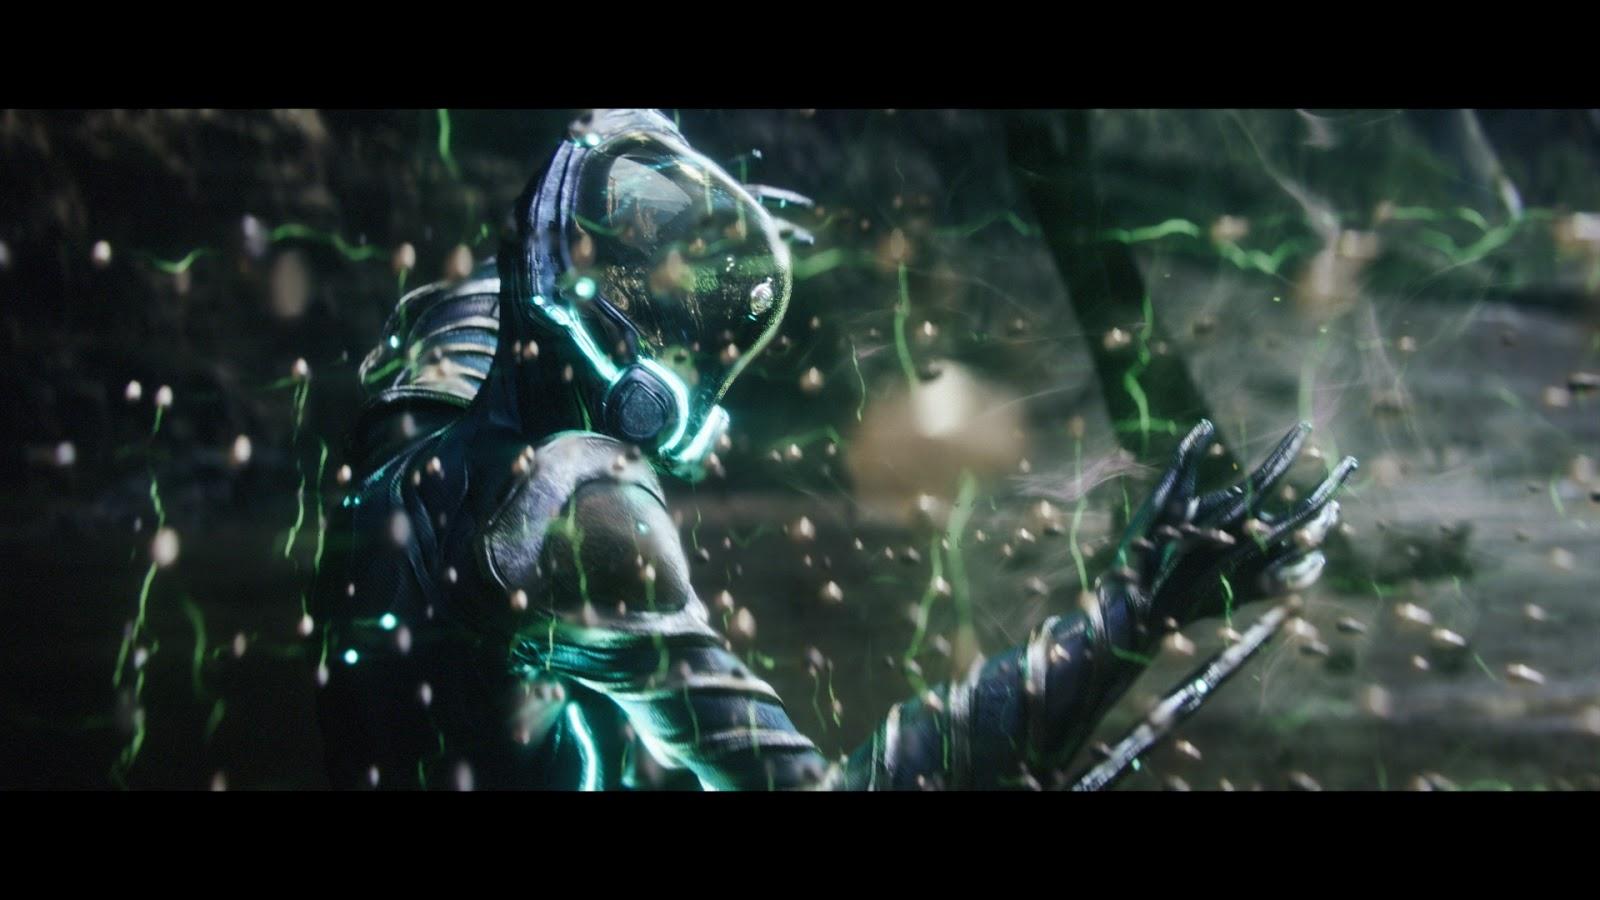 Dan Trachtenberg's New Warframe Film Pits Militarized Clones Against